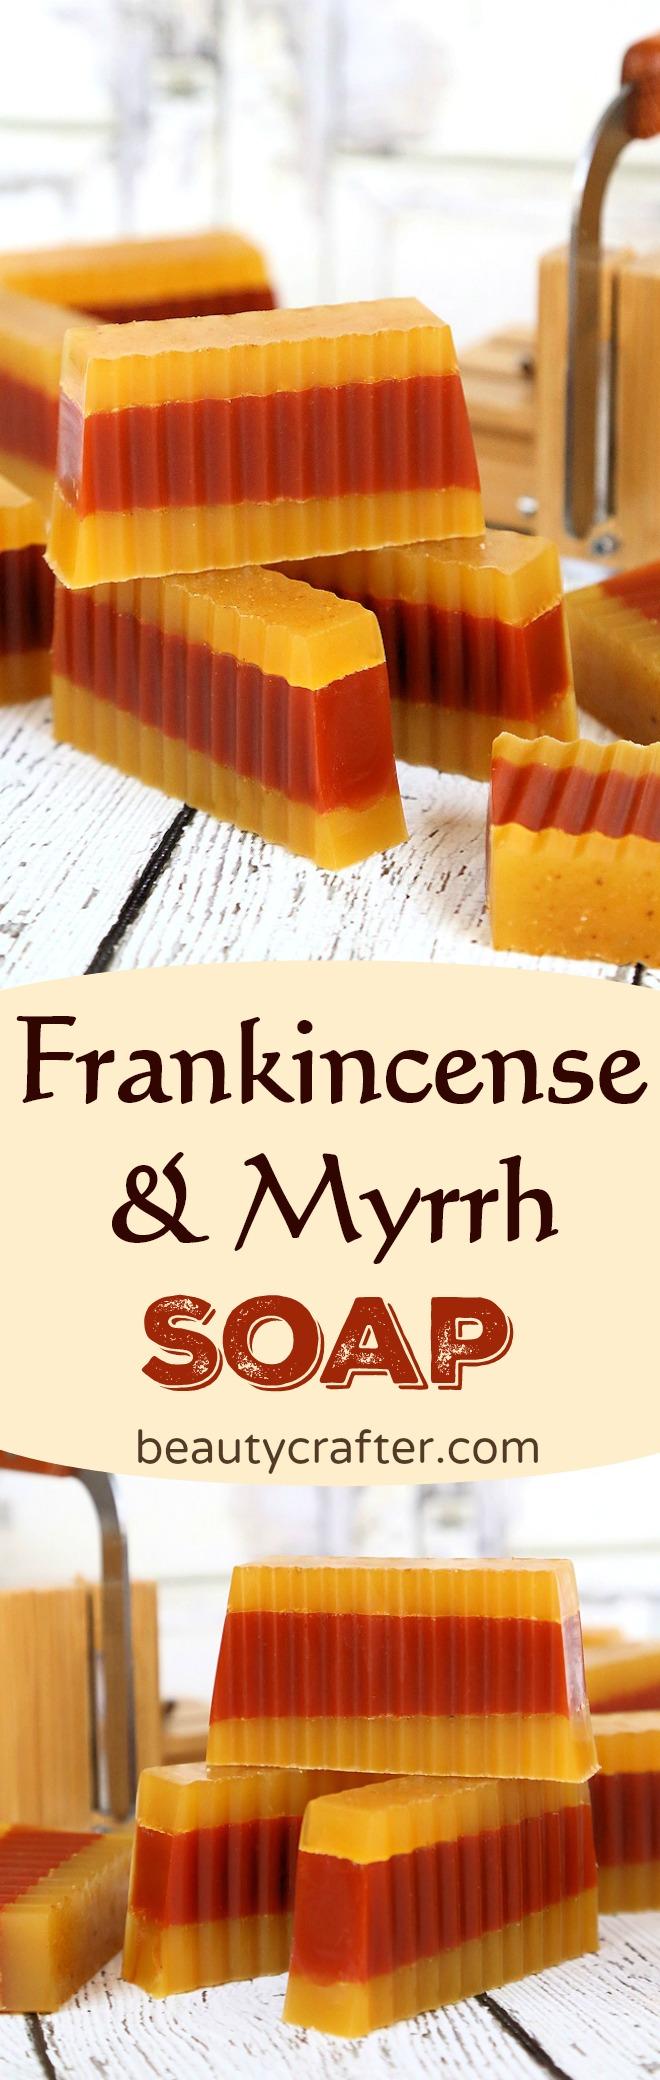 DIY Frankincense Myrrh Soap